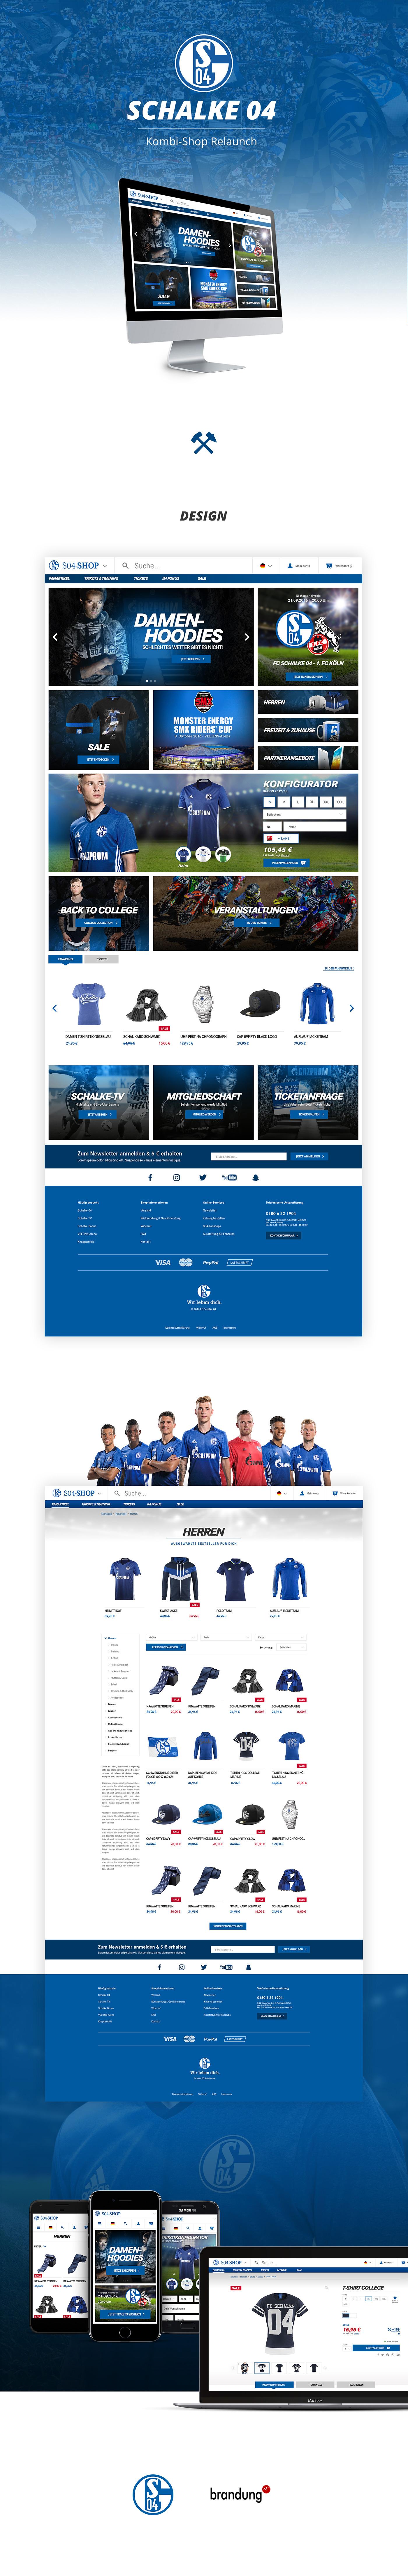 Web design e-commerce shop Responsive schalke Fussball soccer club